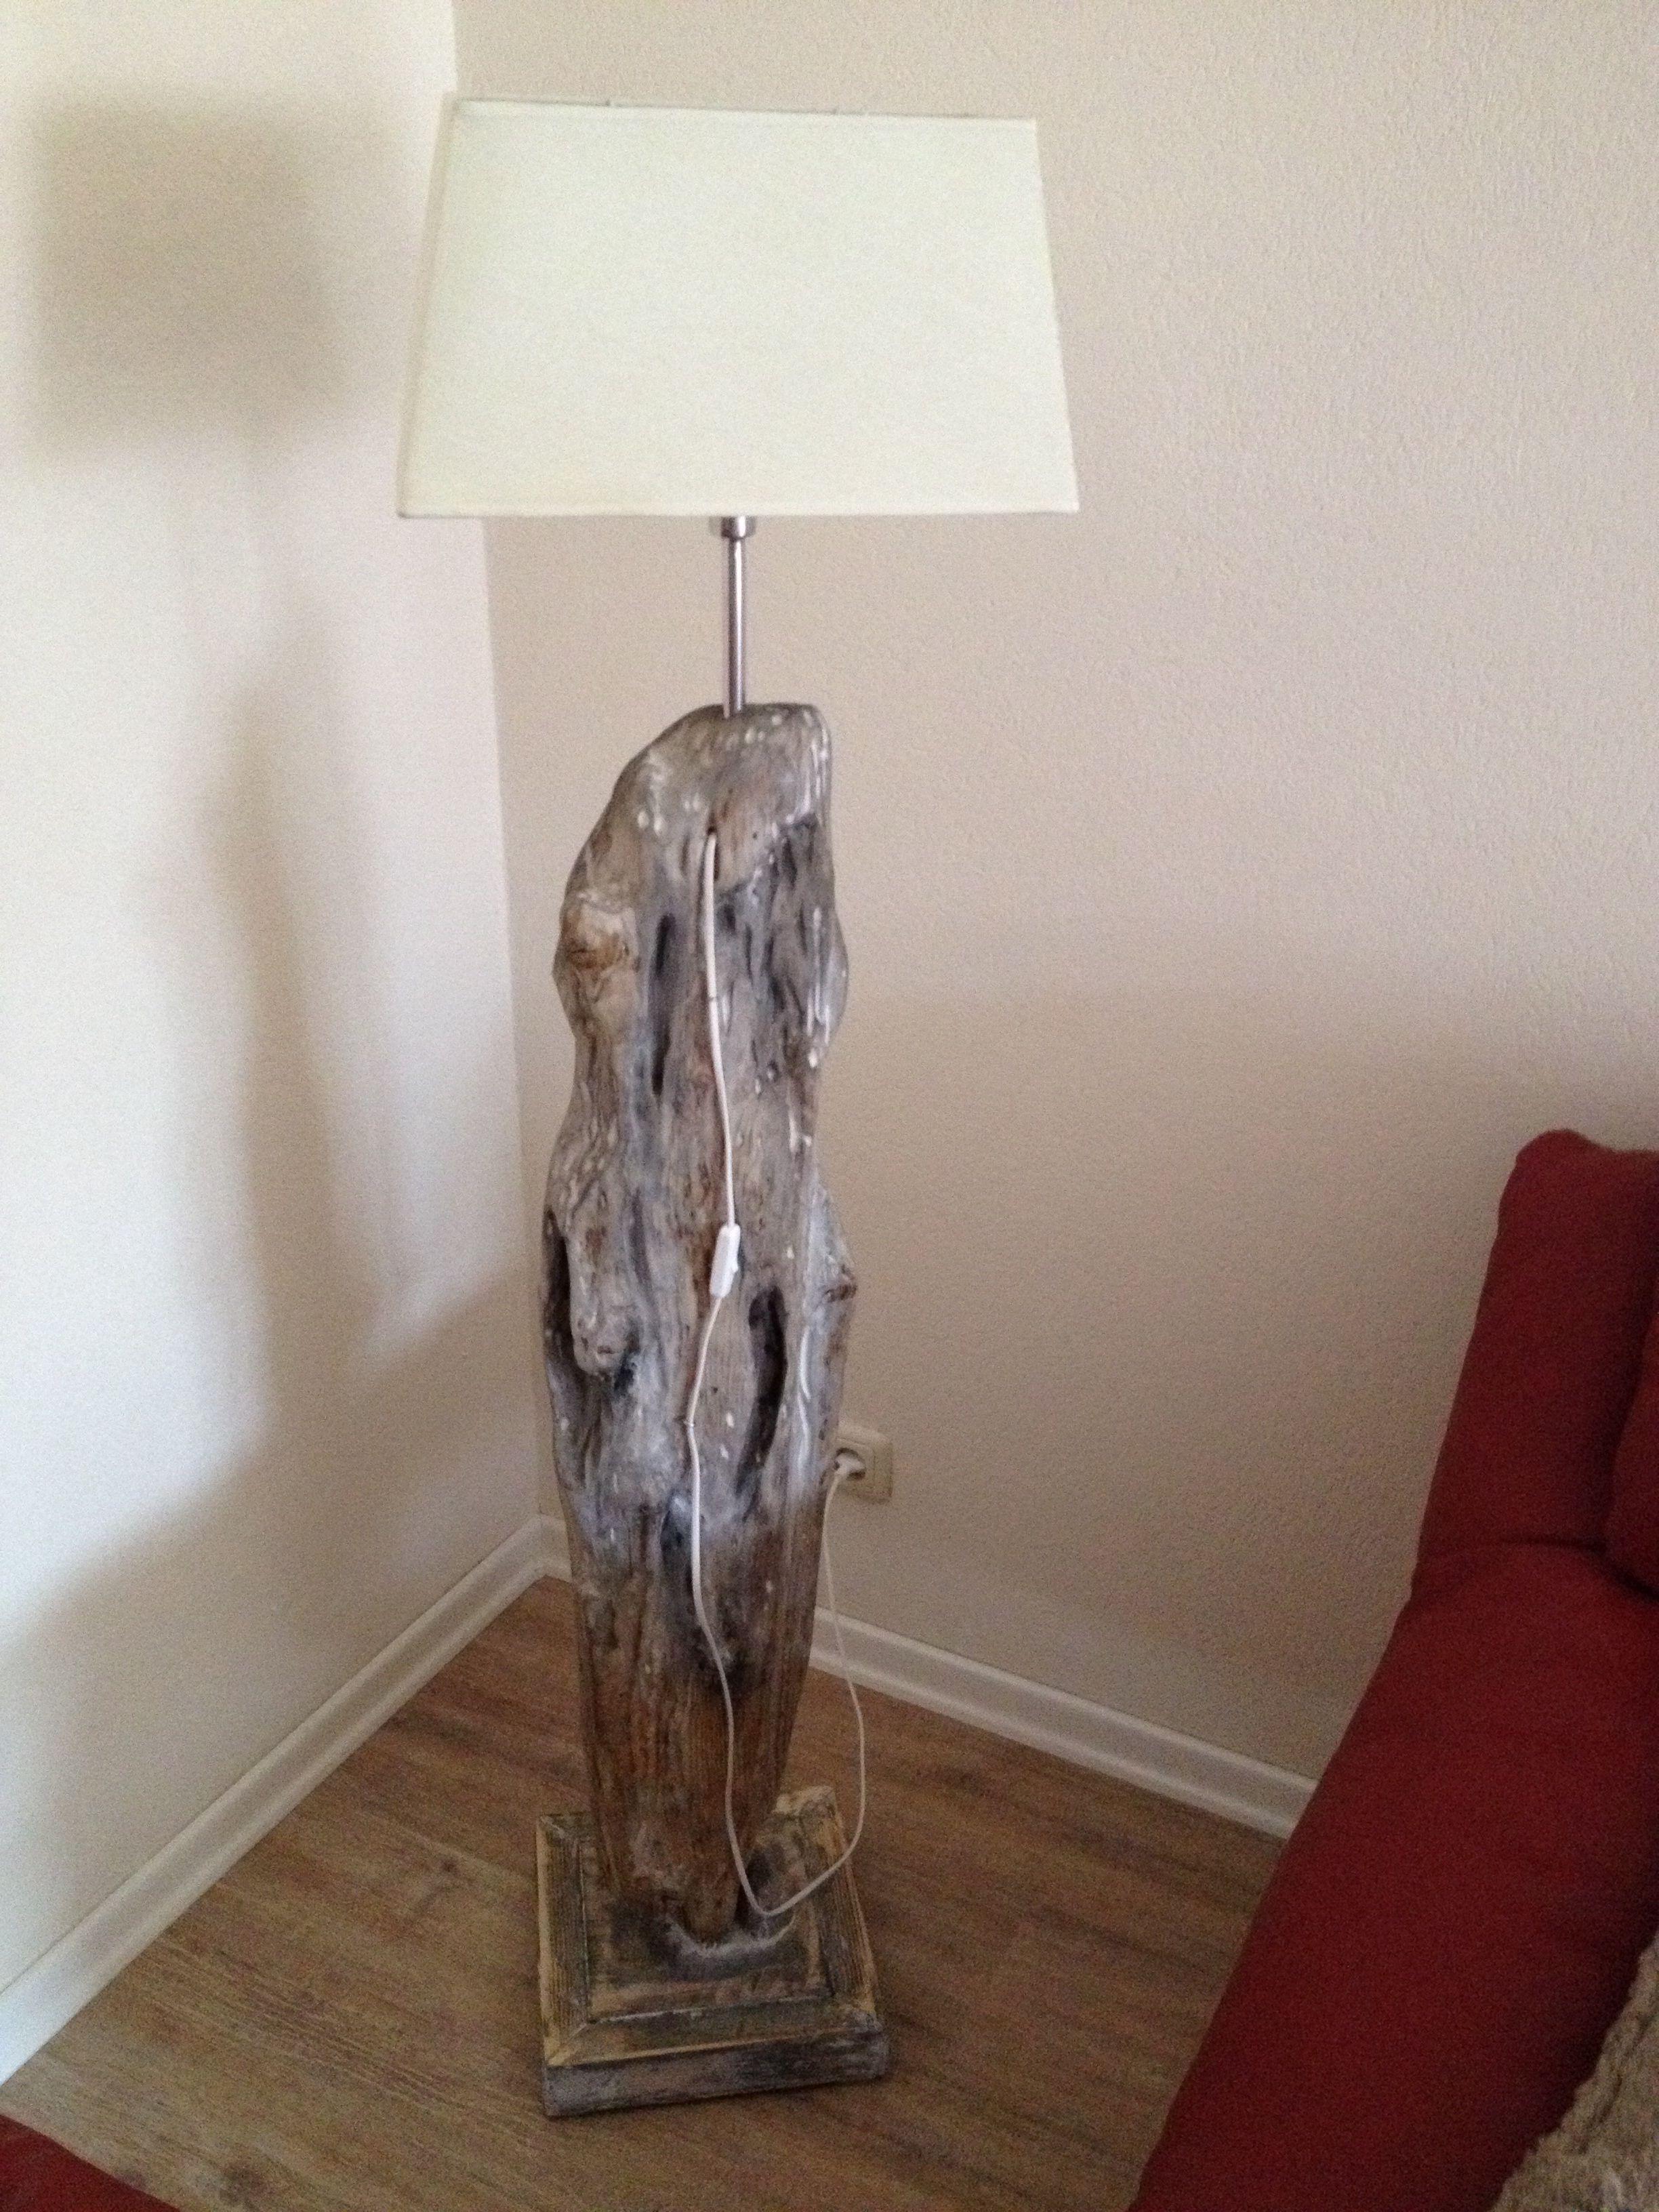 Stehlampe Treibholz Selber Gebaut Stehlampe Holz Stehlampe